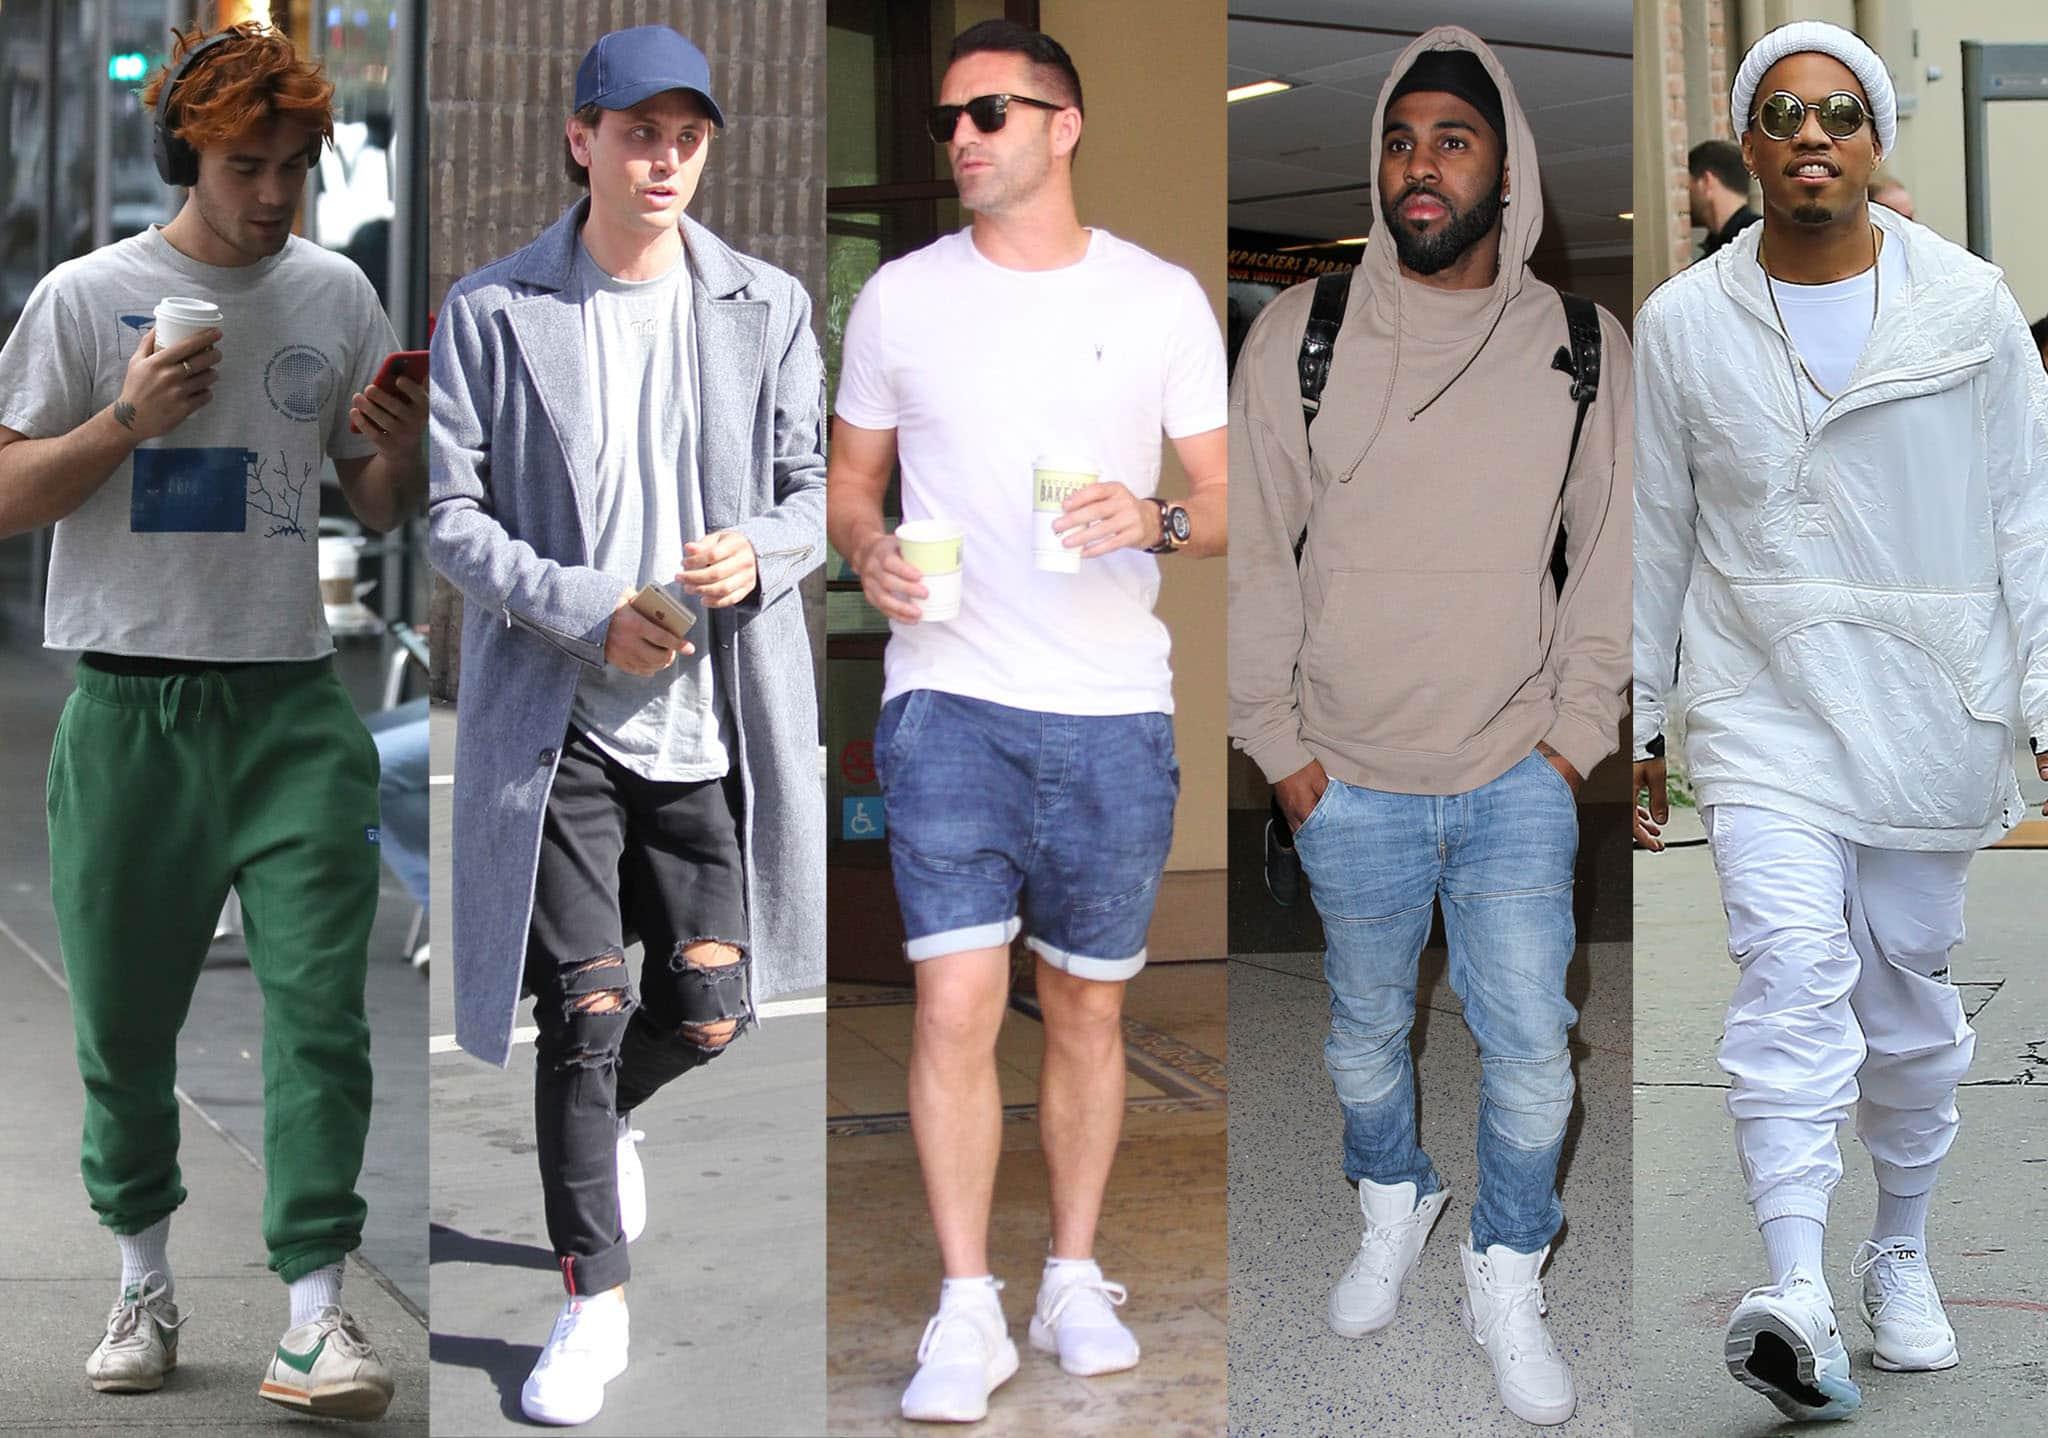 KJ Apa, Jonathan Cheban, Robbie Keane, Jason Derulo, and Anderson Paak wearing white sneakers